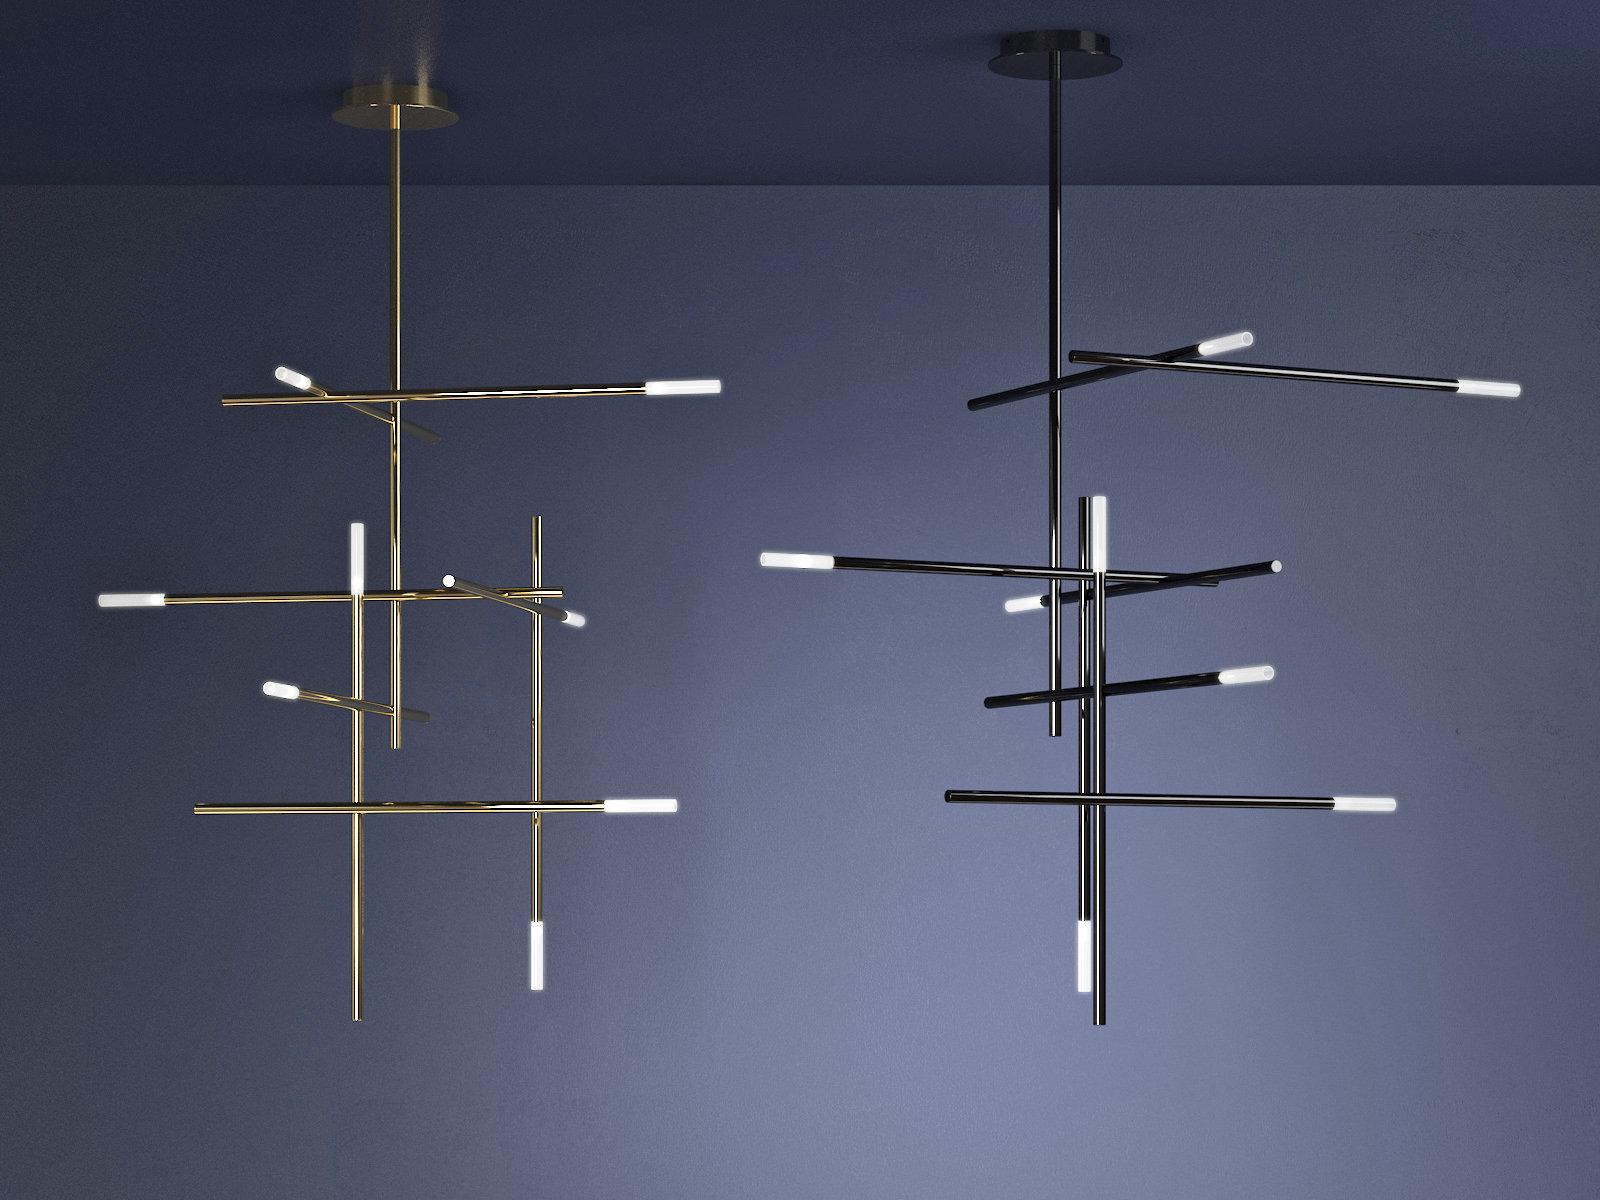 Kitami L 吊灯-室内台灯,C4D模型-云酷网c4d